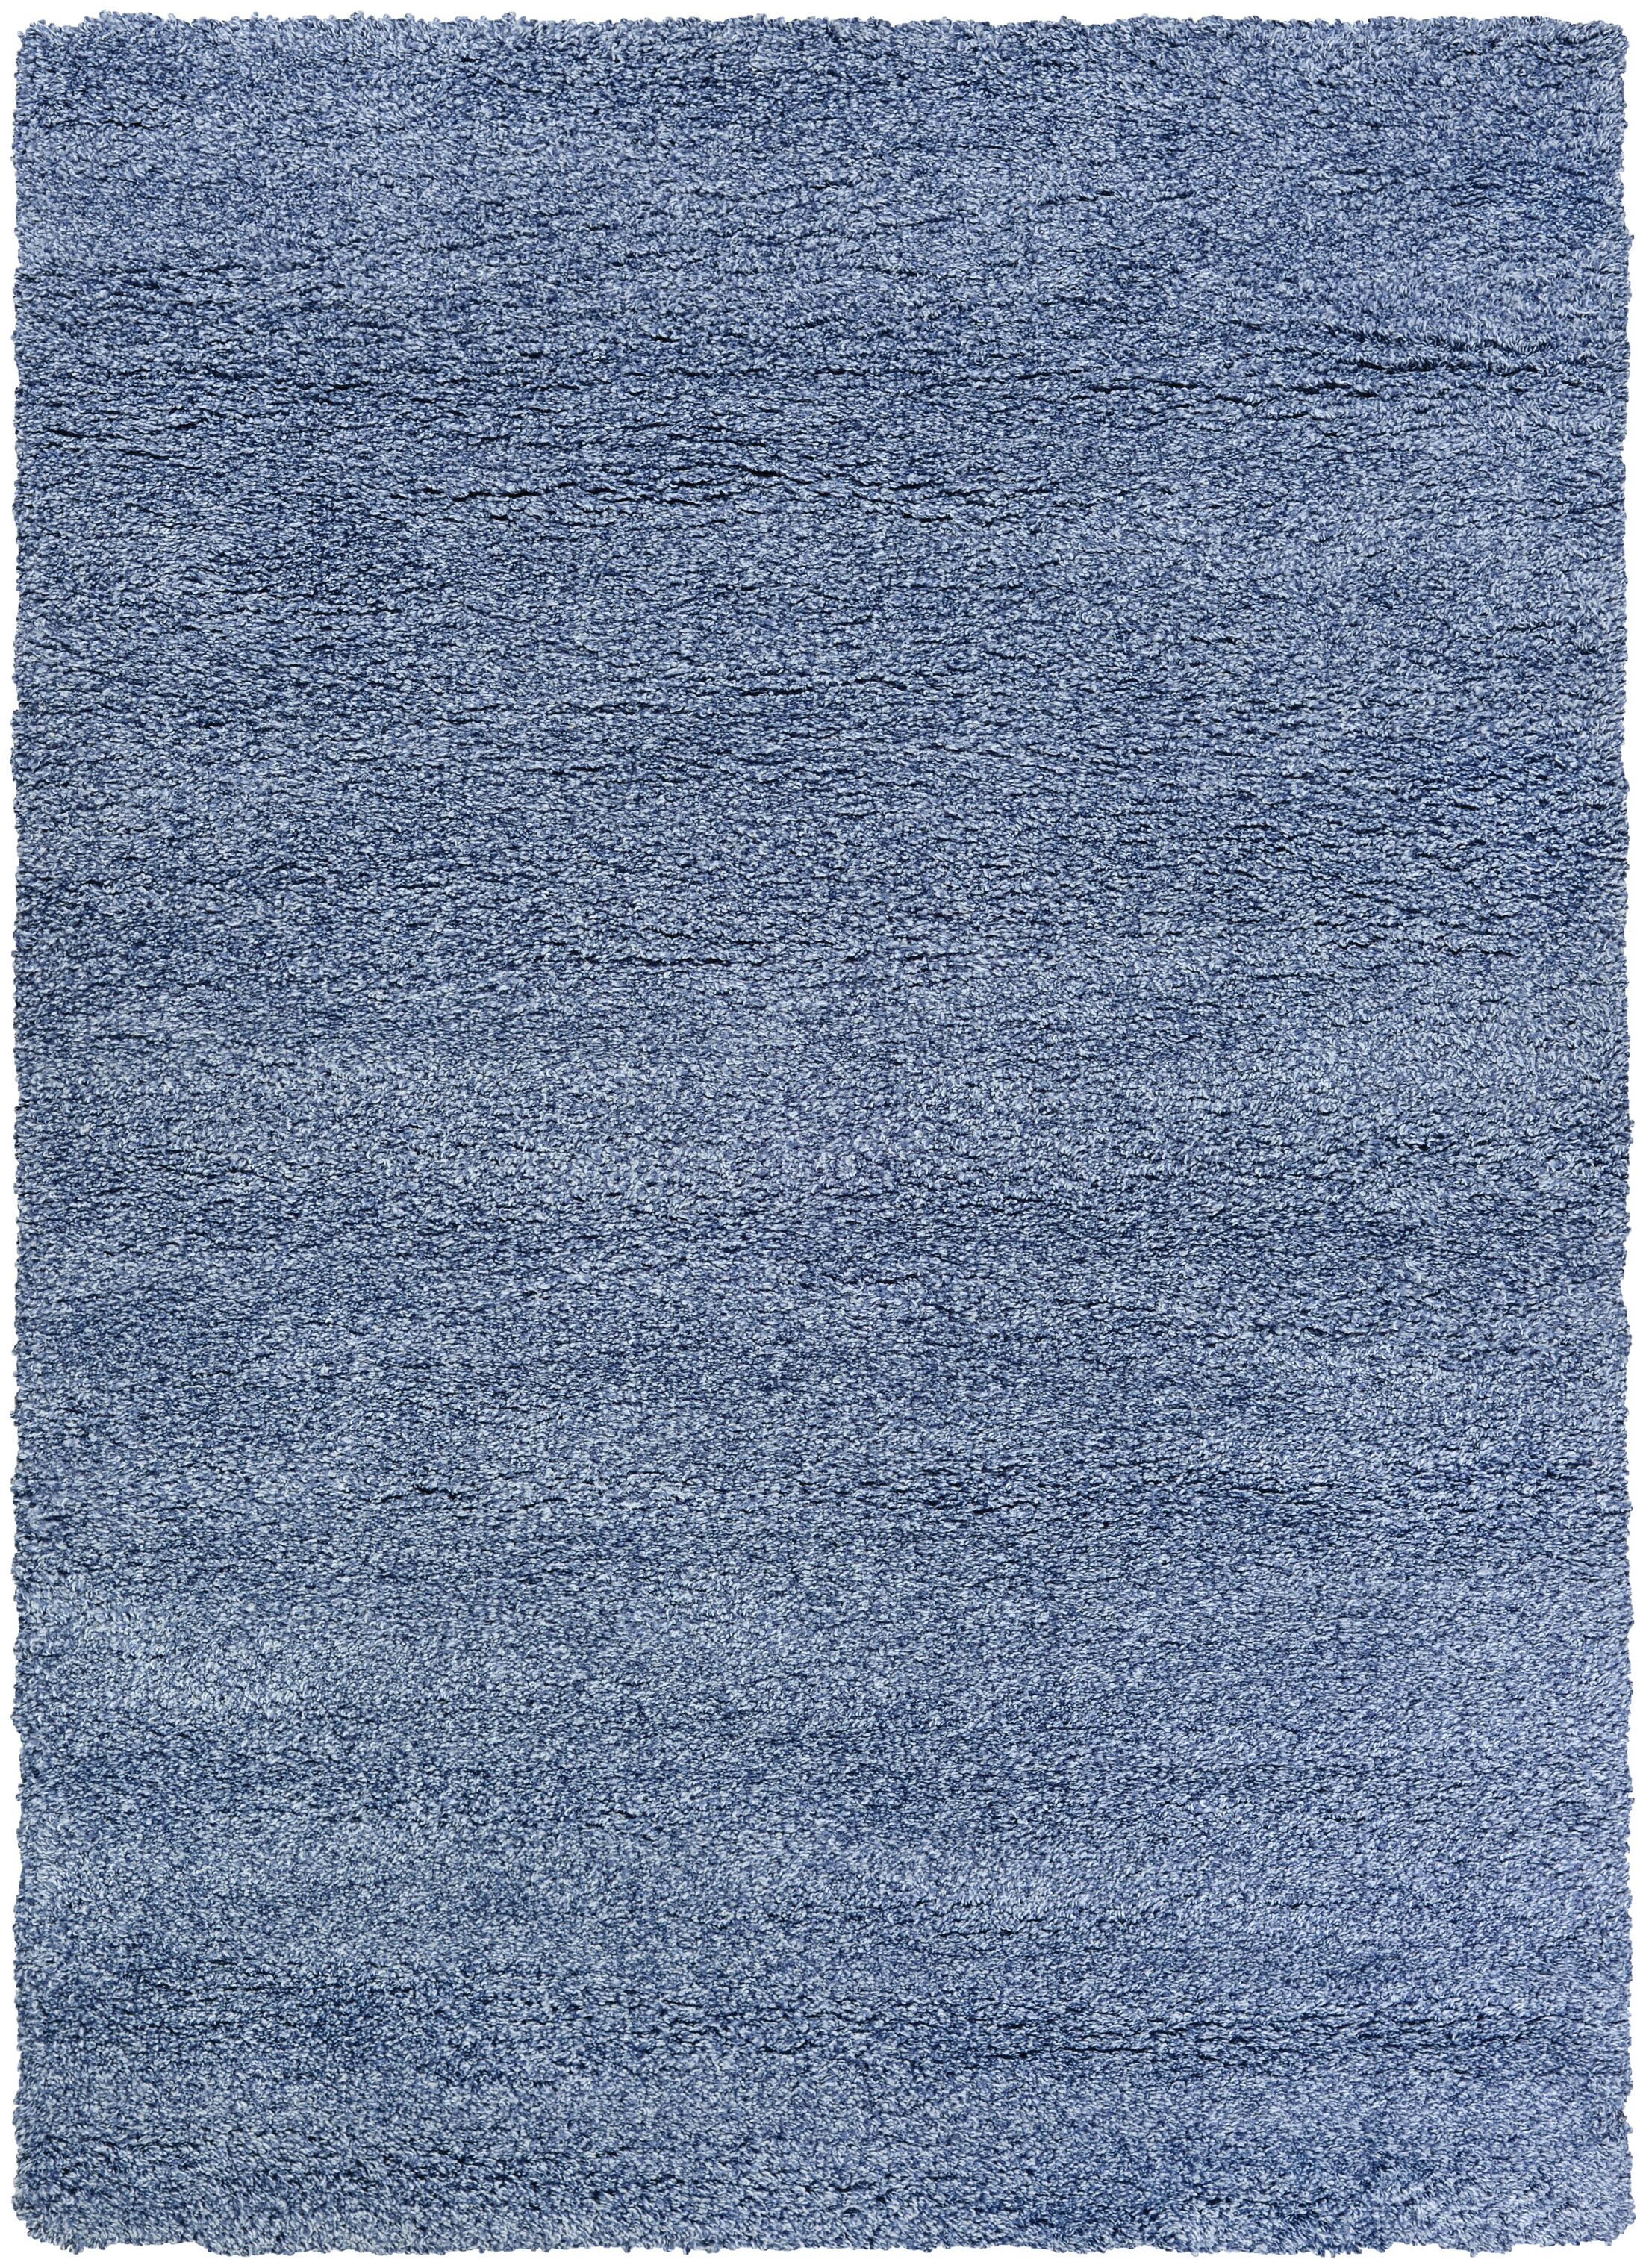 Risinger Light Blue Area Rug Rug Size: Rectangle 5'3